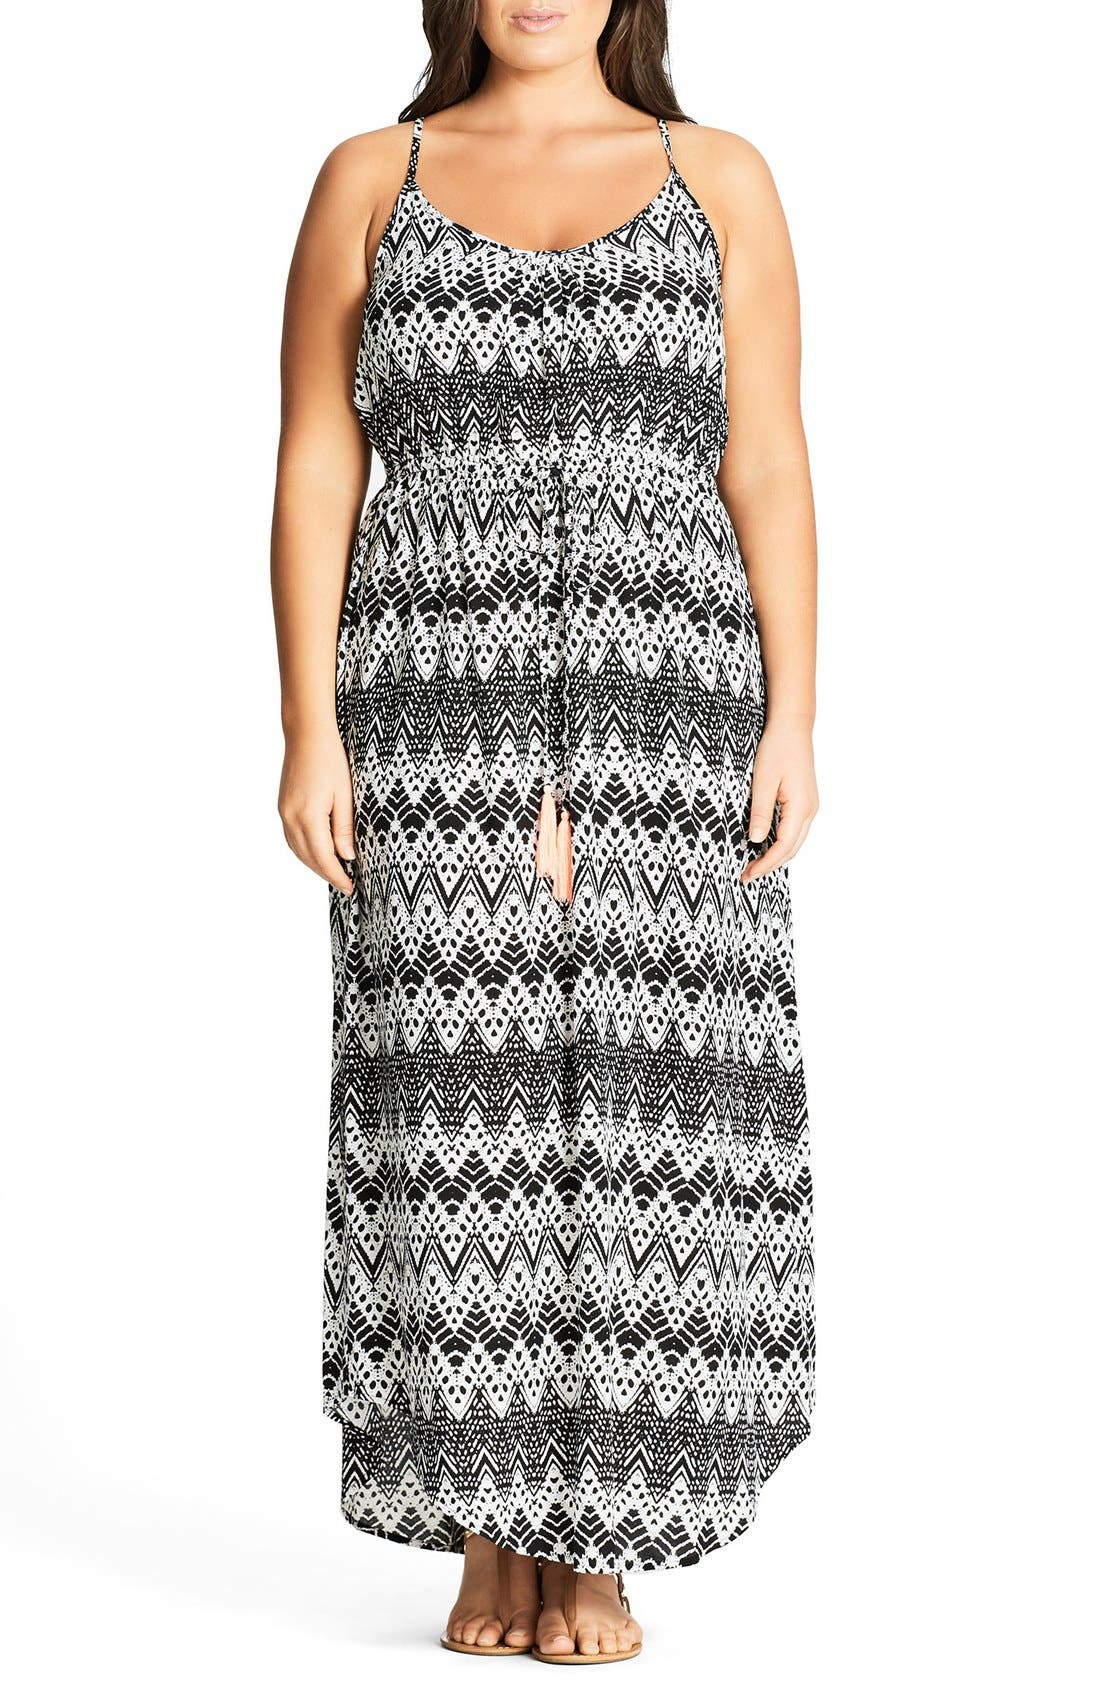 Alternate Image 1 Selected - City Chic Mono Print Maxi Dress (Plus Size)